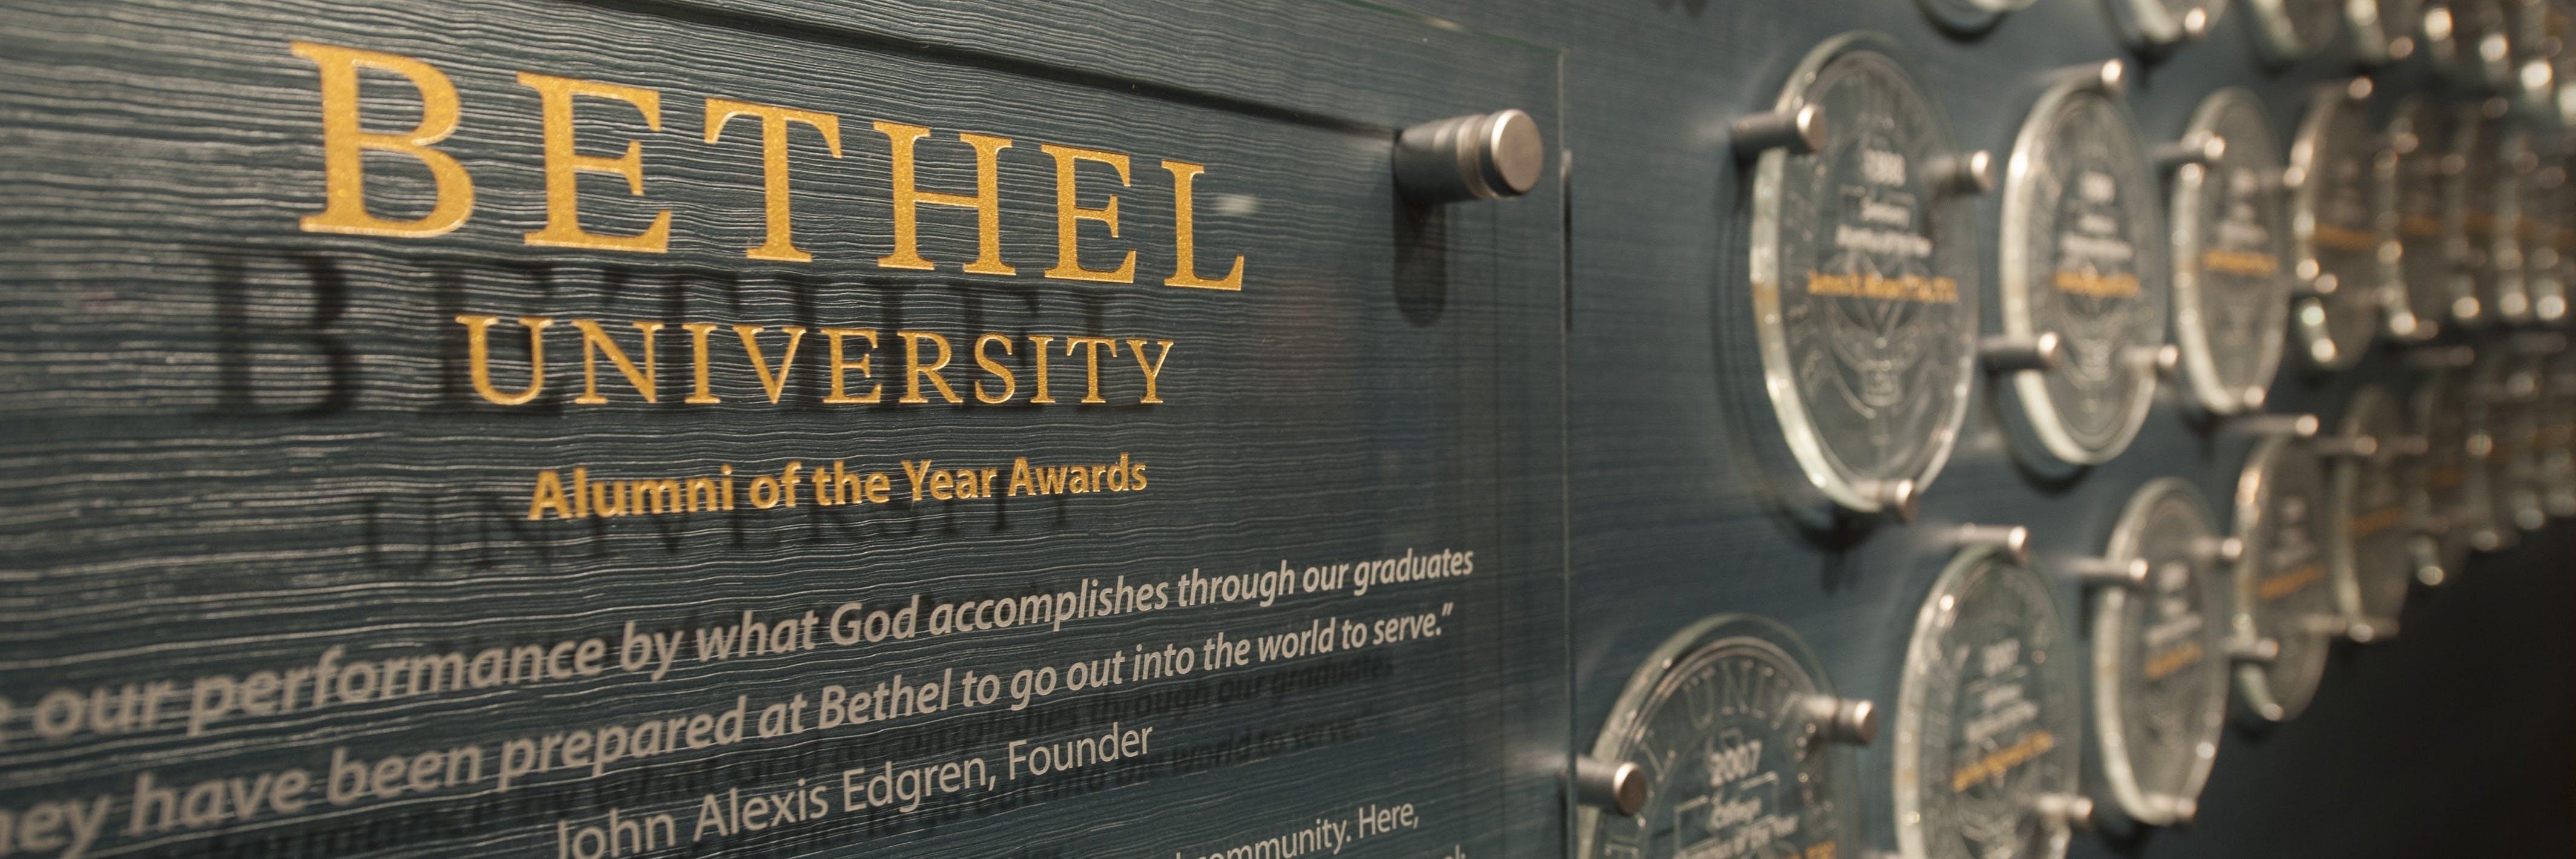 Alumni of the Year awards